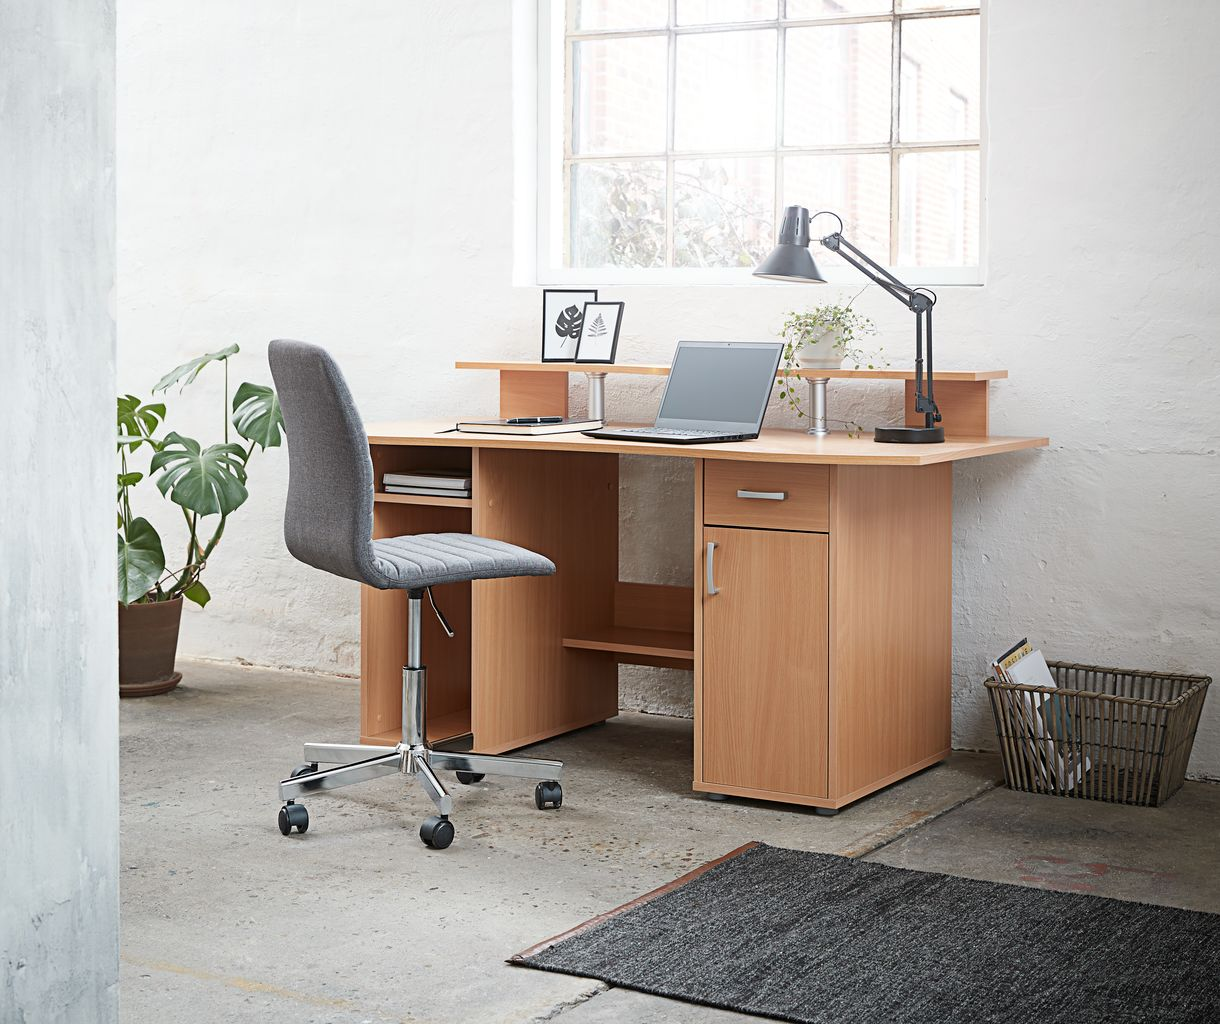 Bureaustoel ABILDHOLT d.grijschroom | JYSK